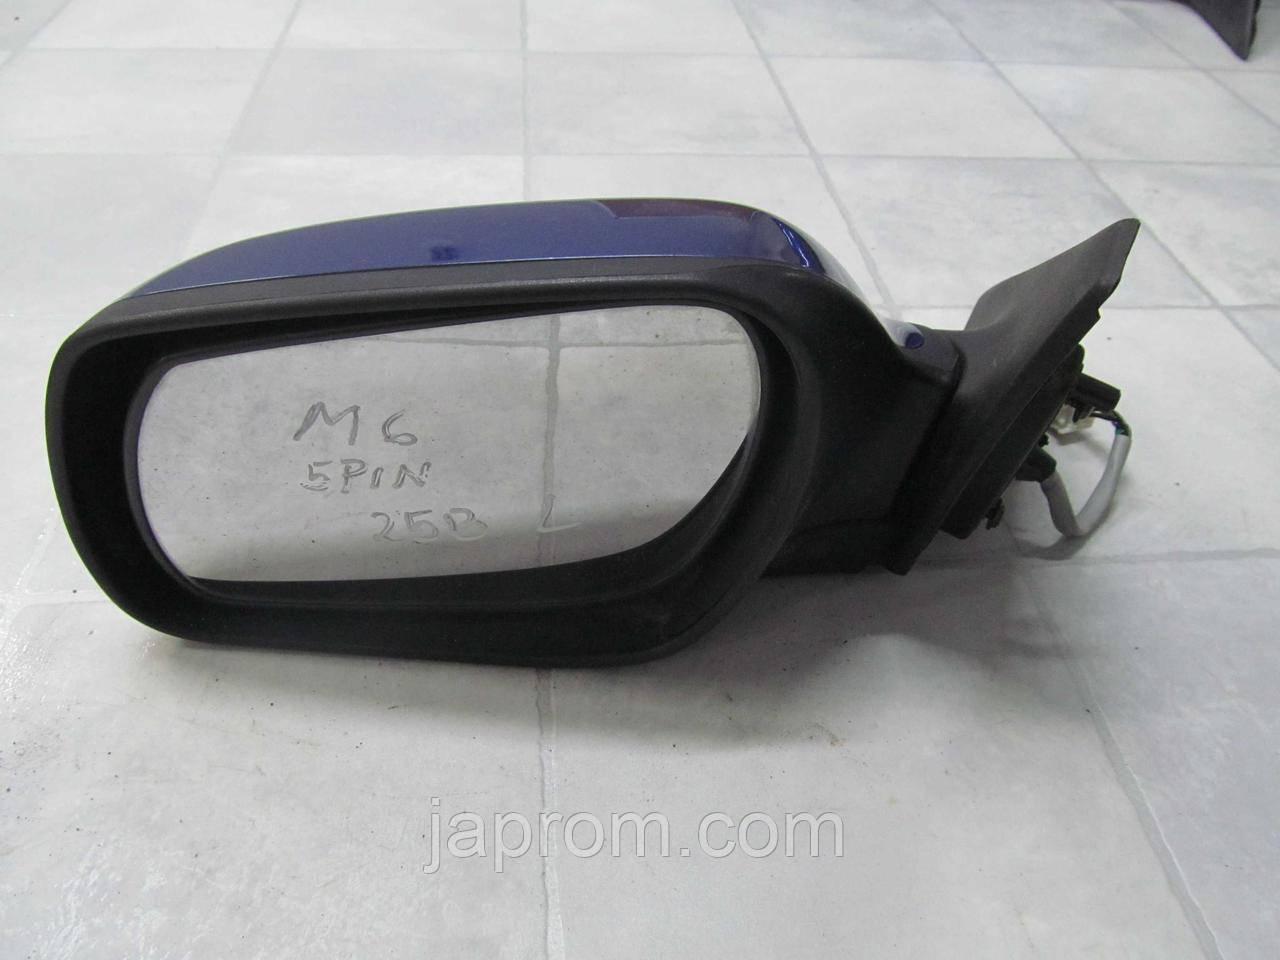 Зеркало заднего вида левое Mazda 6 GG 2002-2007г.в 4/5дв. синие